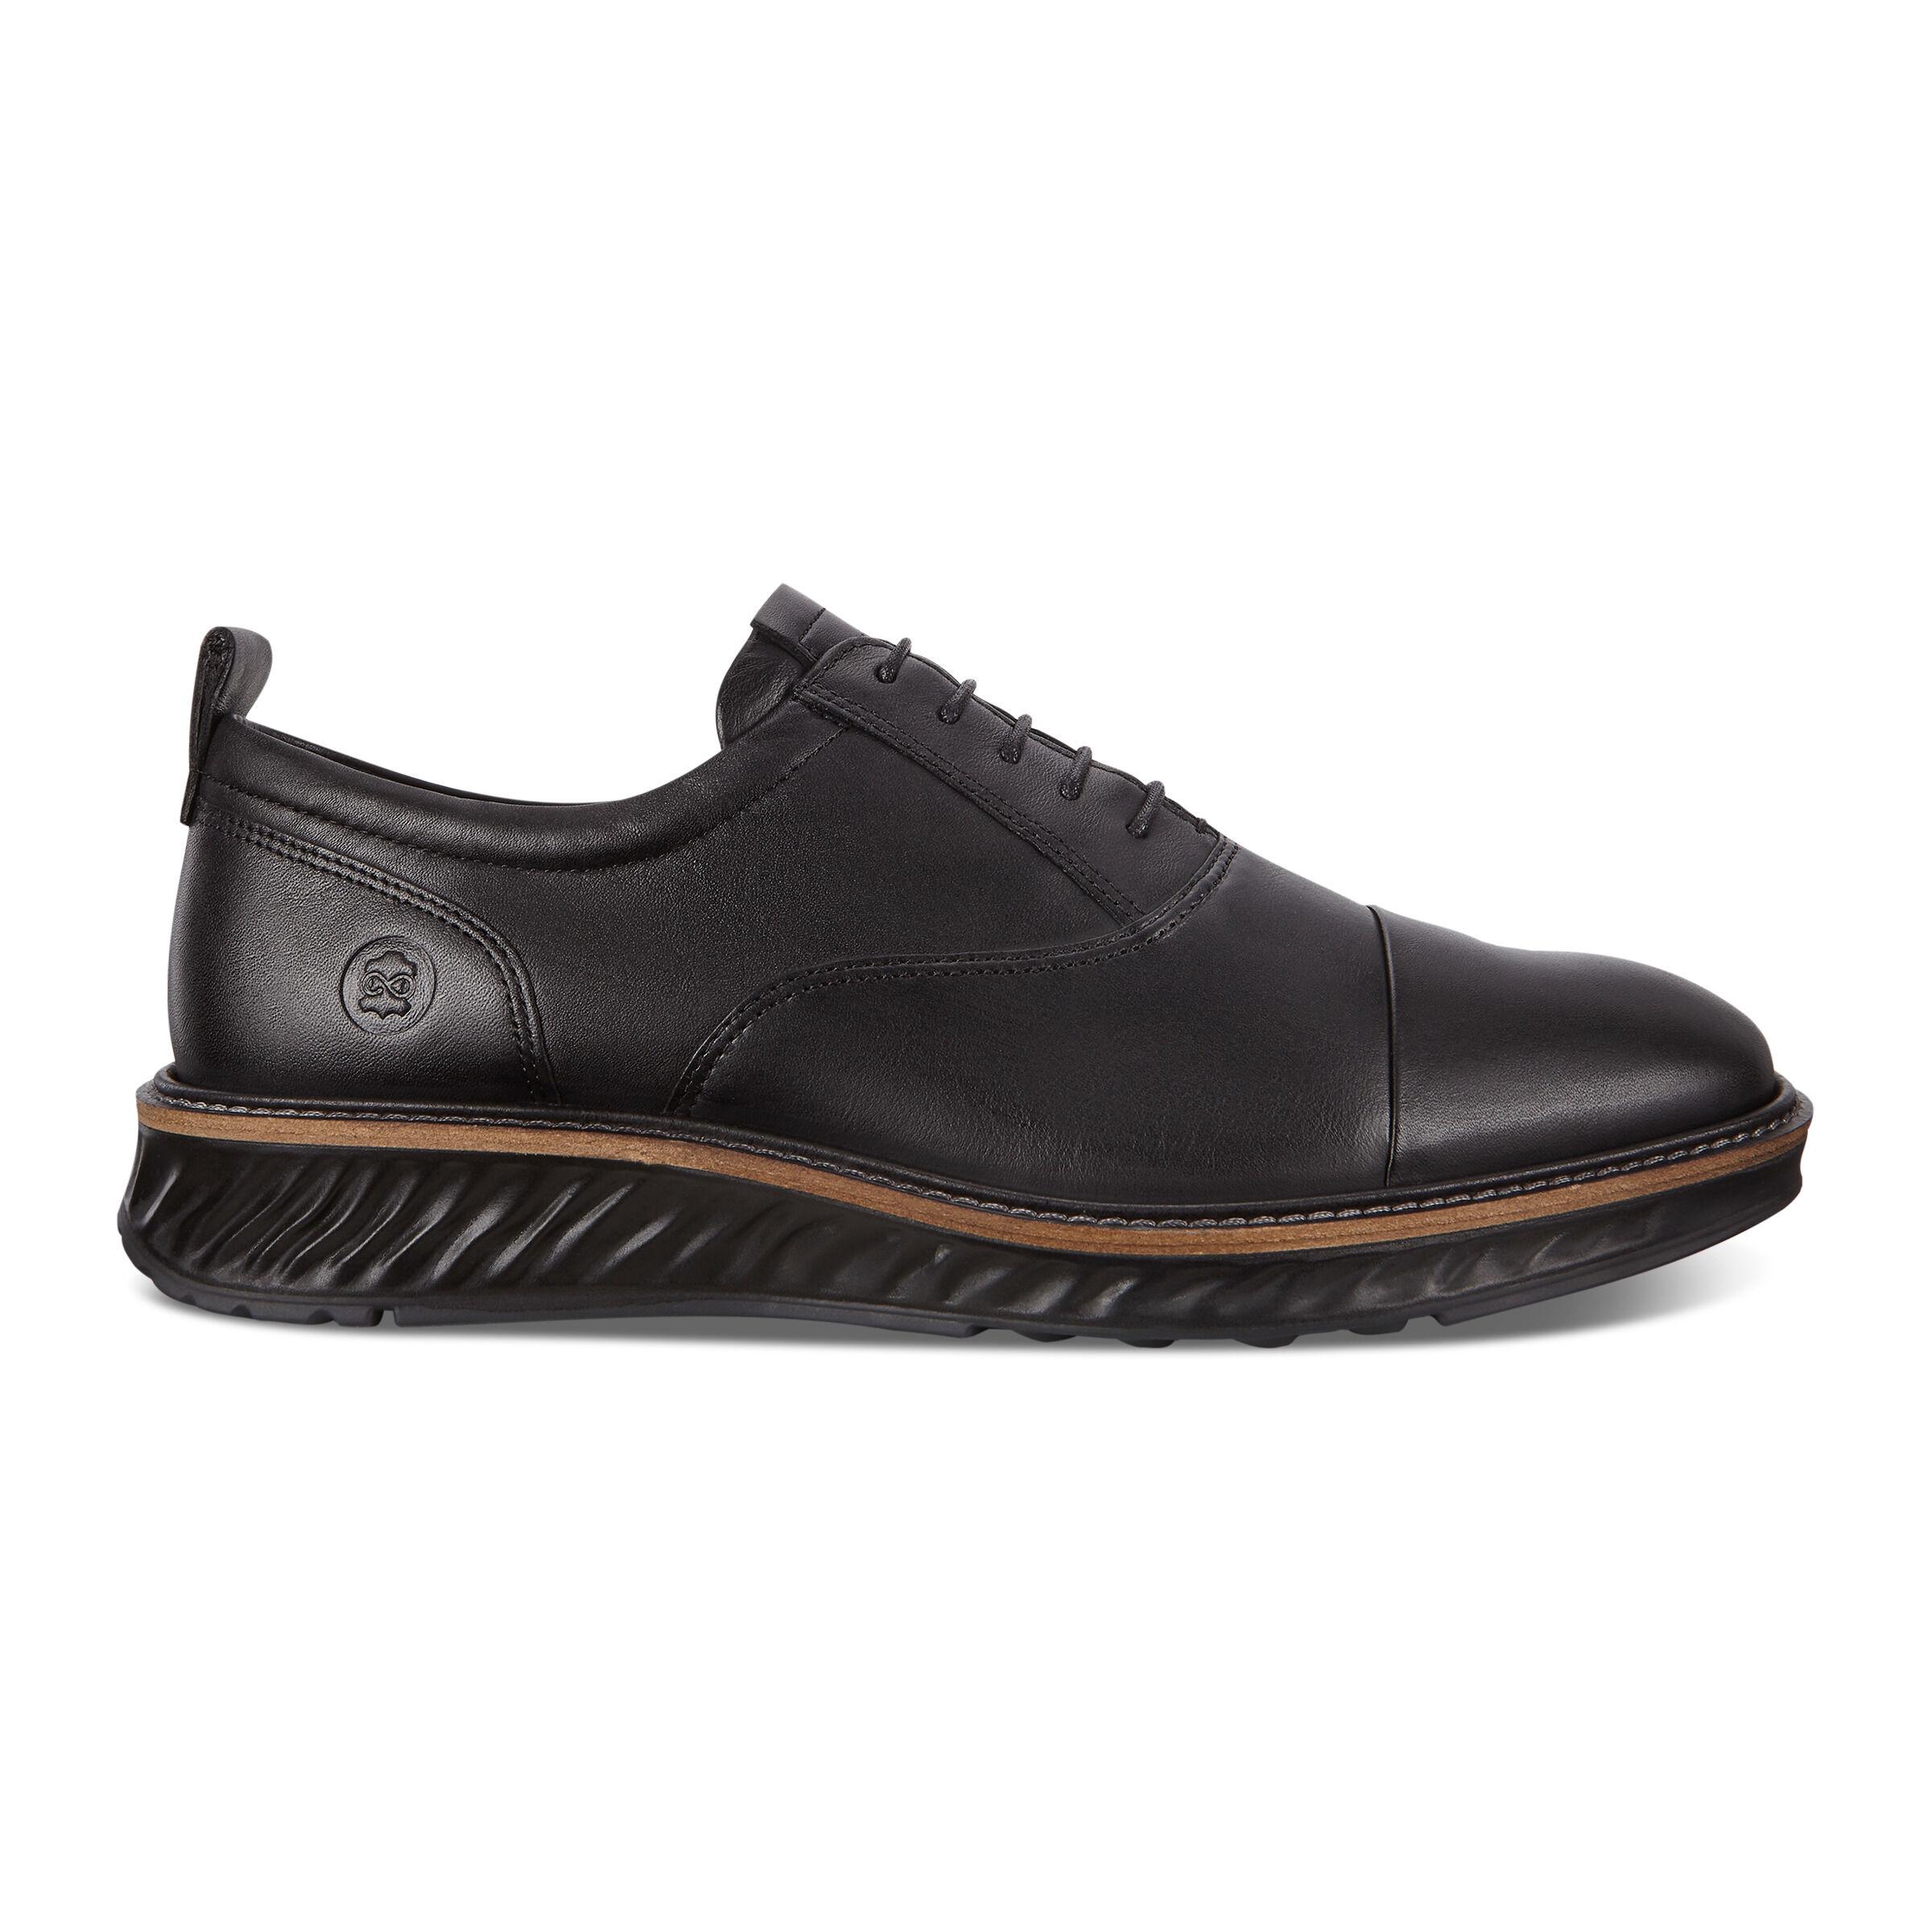 ECCO ST.1 Hybrid Cap-toe Oxford Mens Shoes